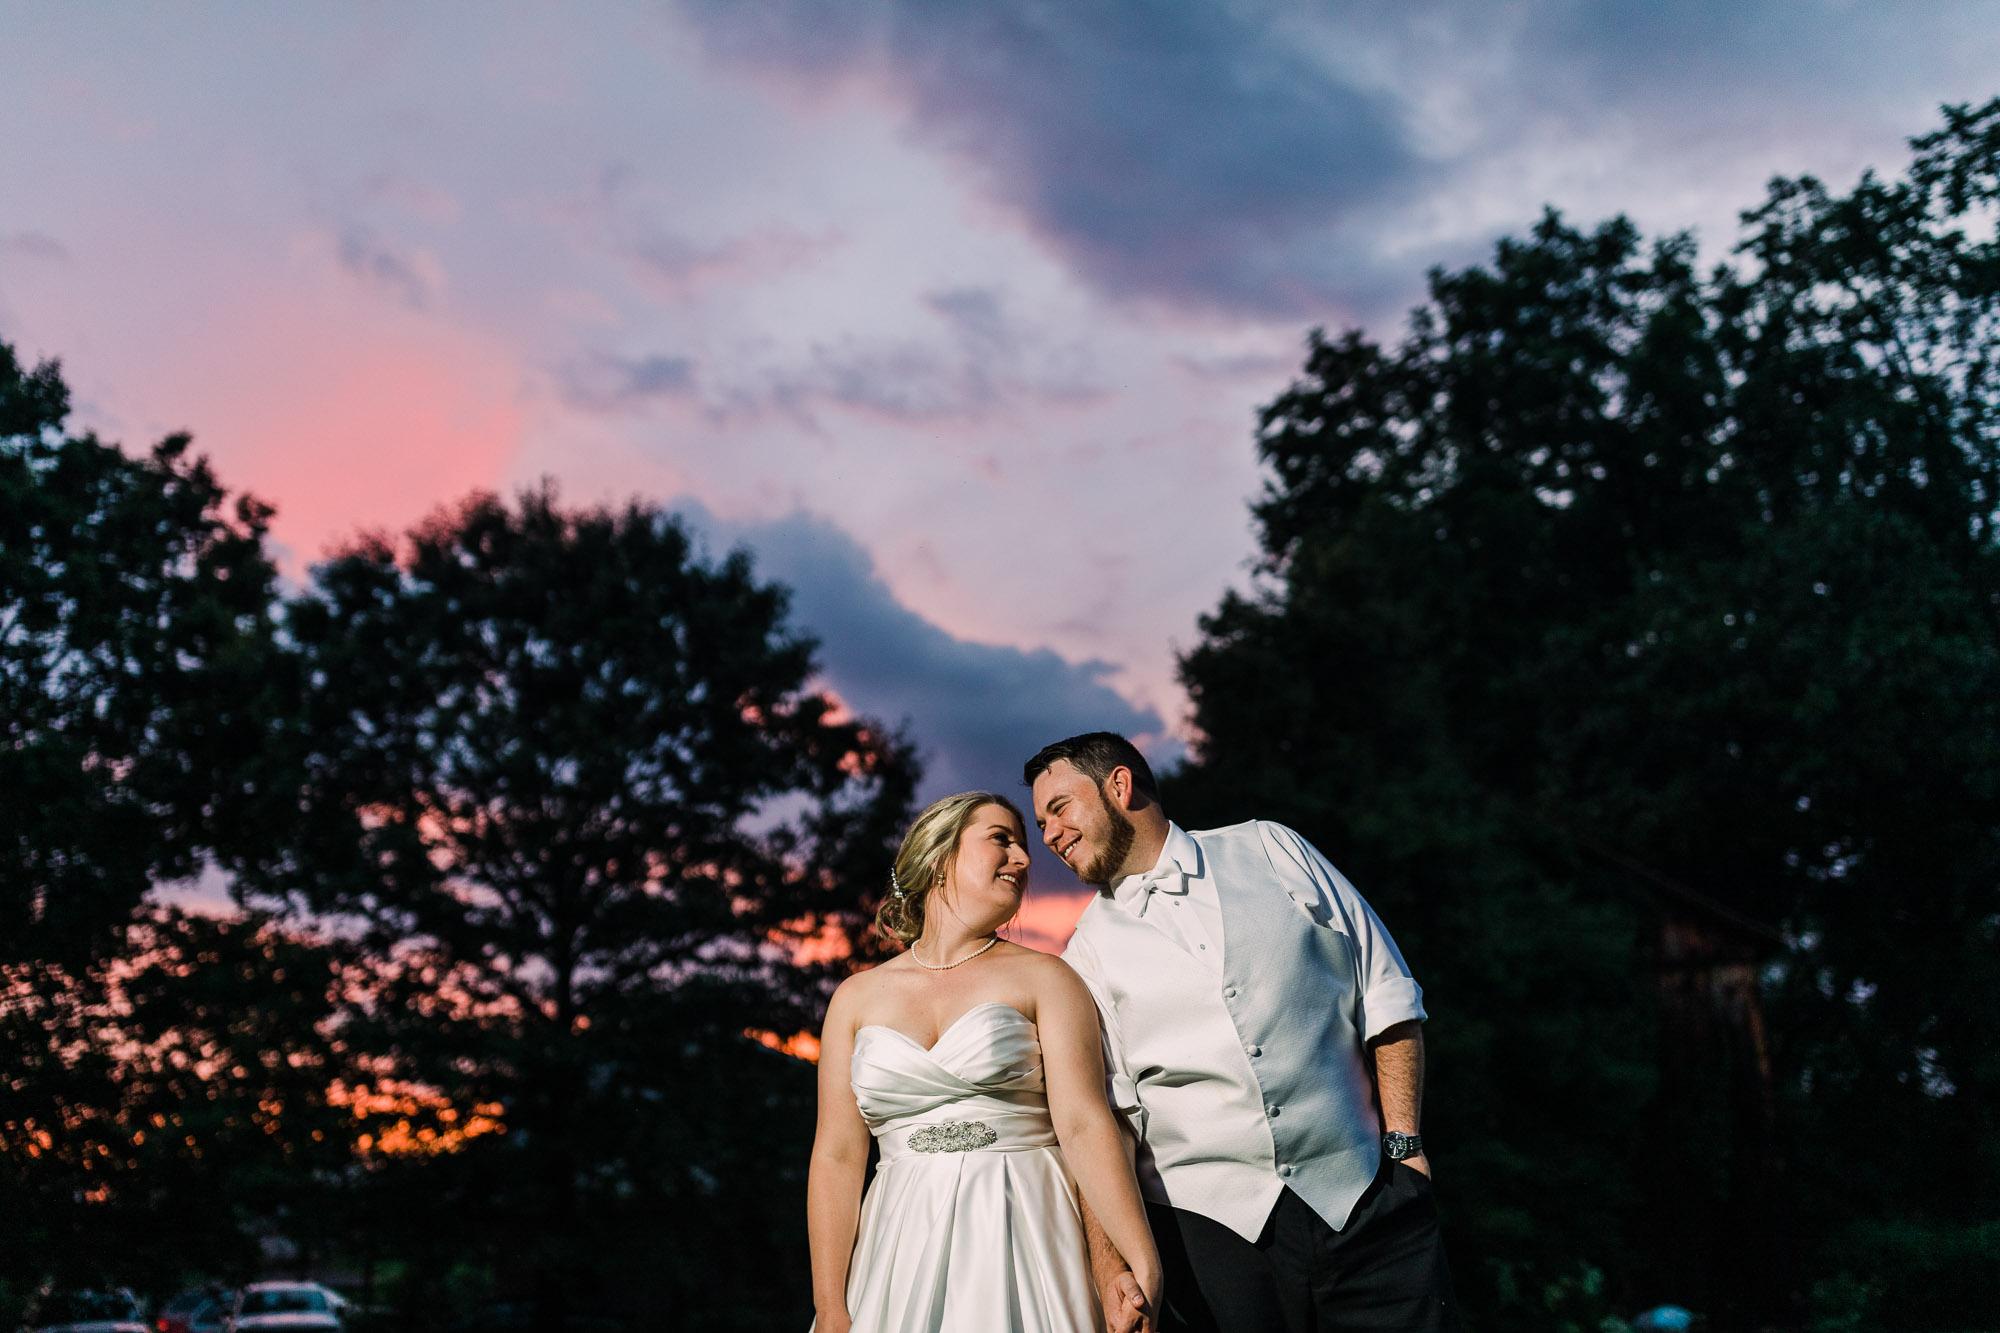 isle-of-que-wedding-7439.jpg